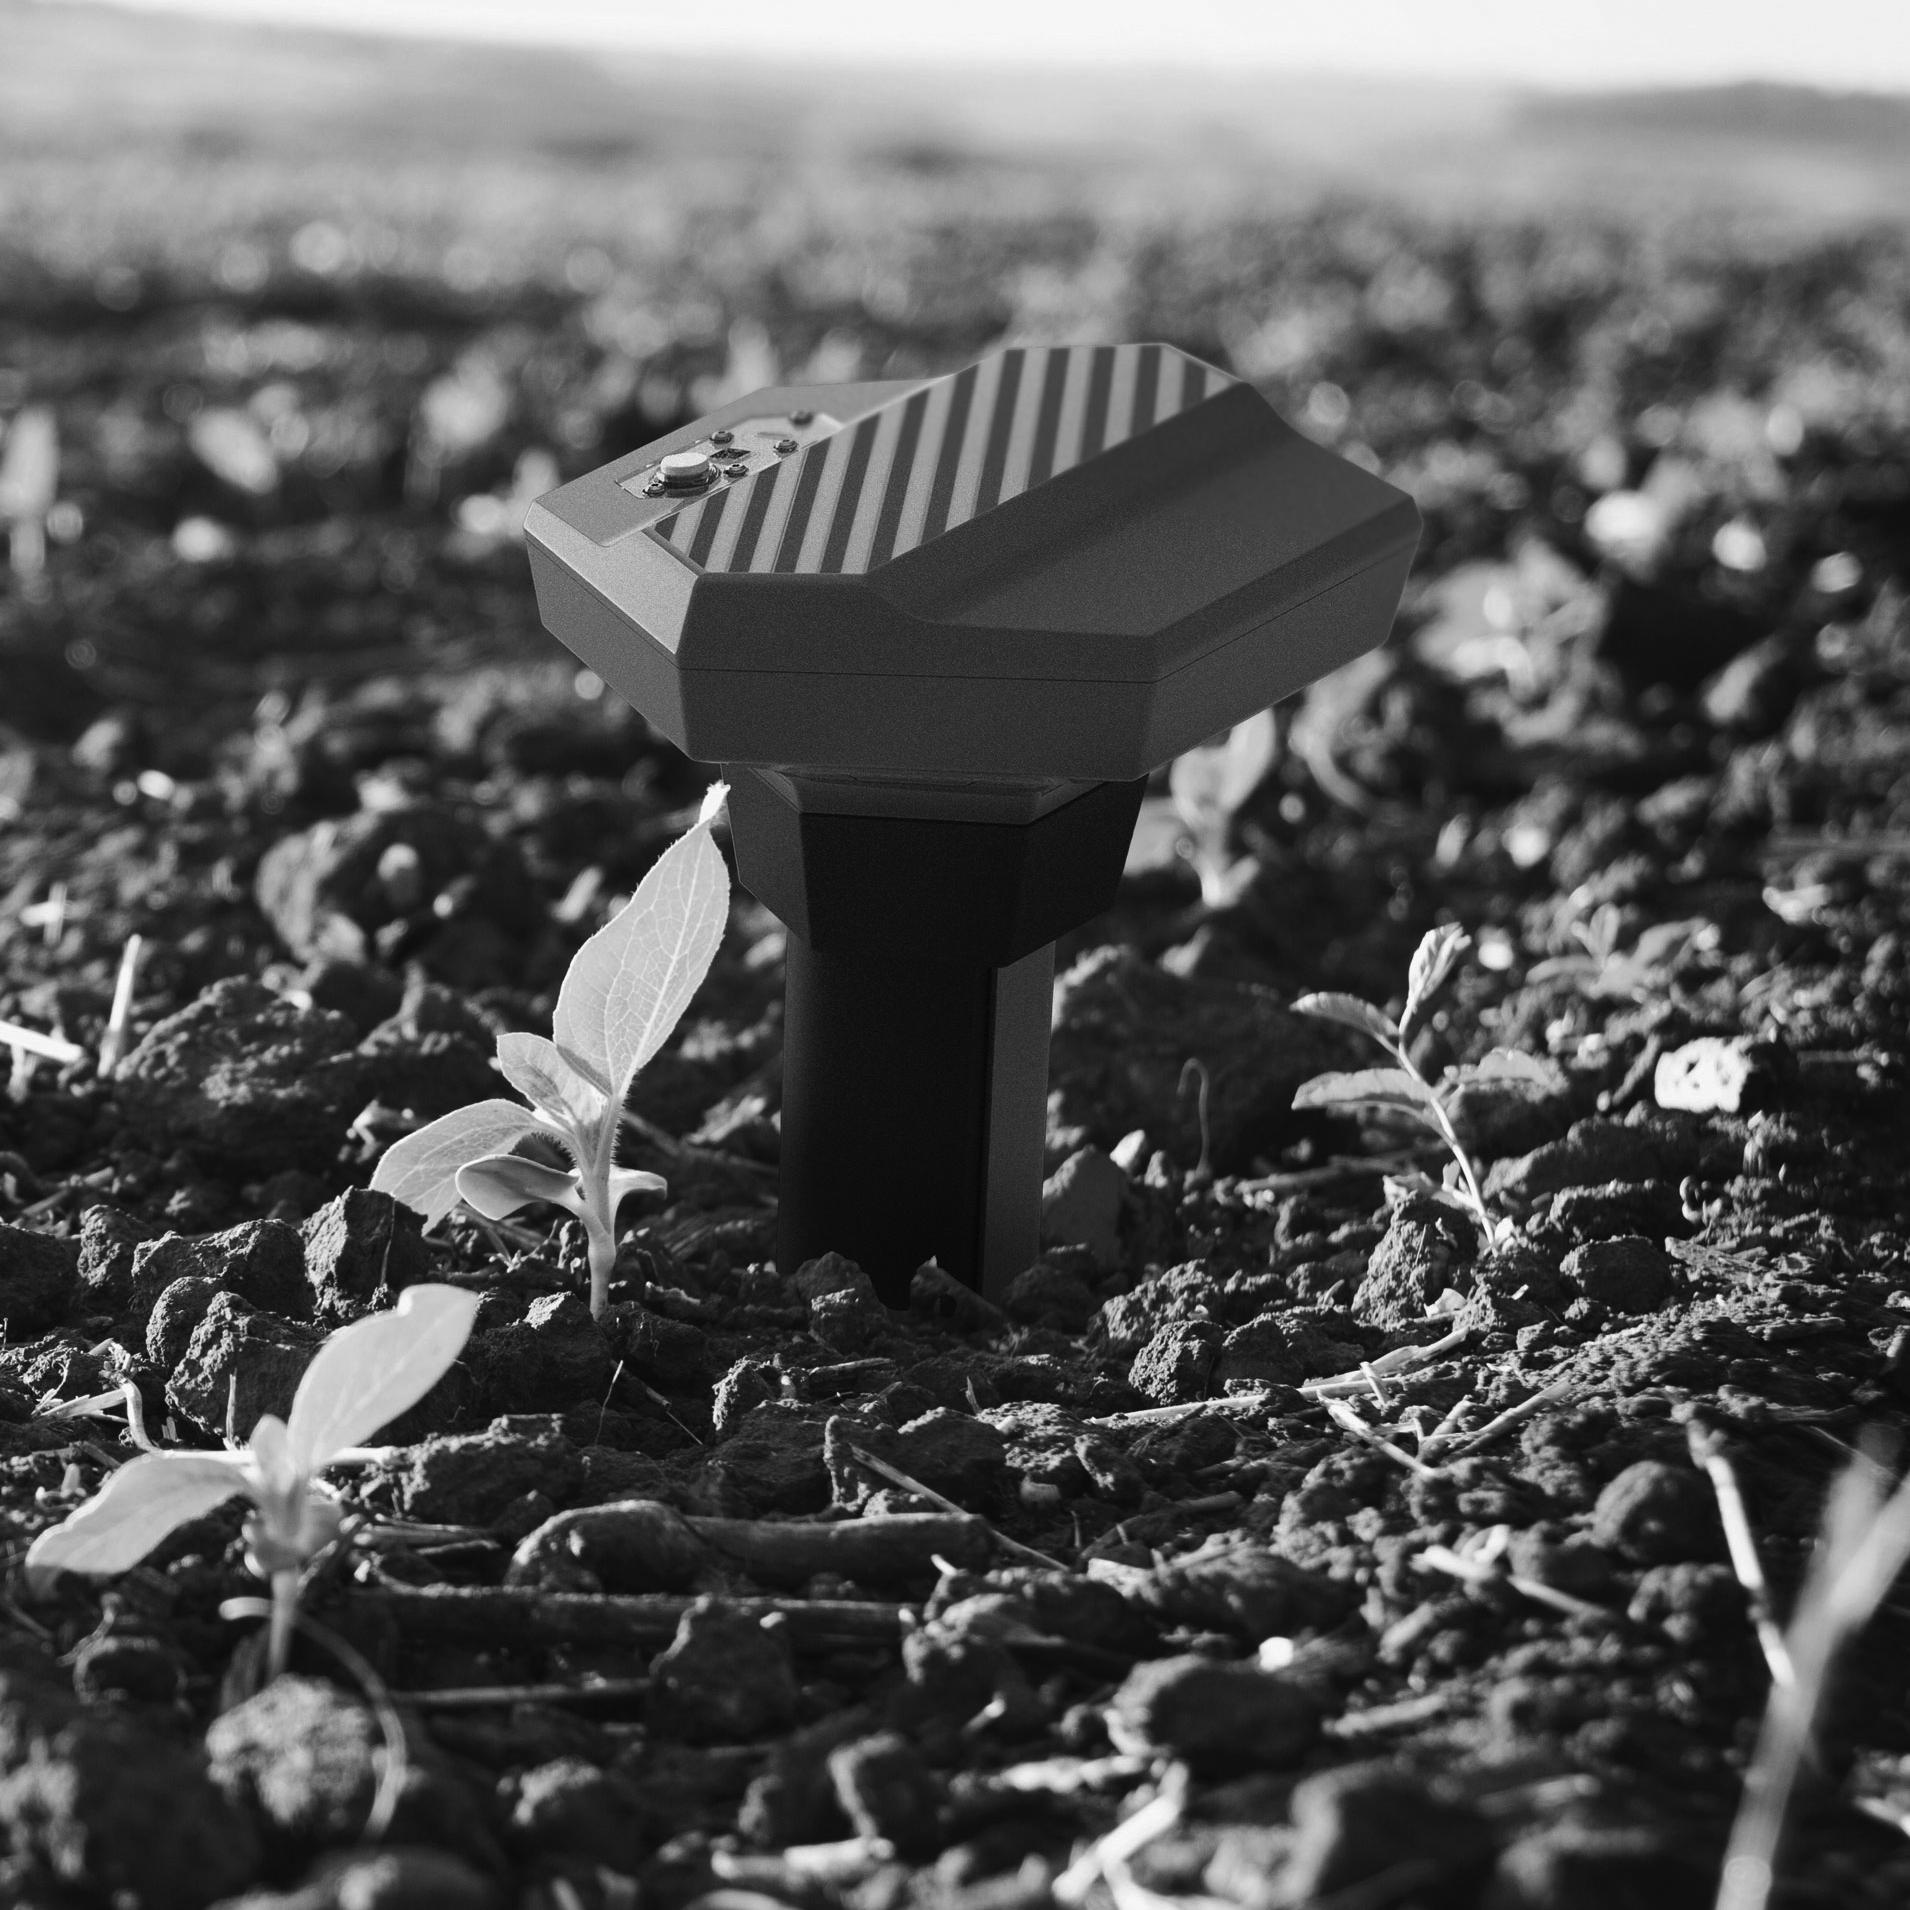 Soil sensors